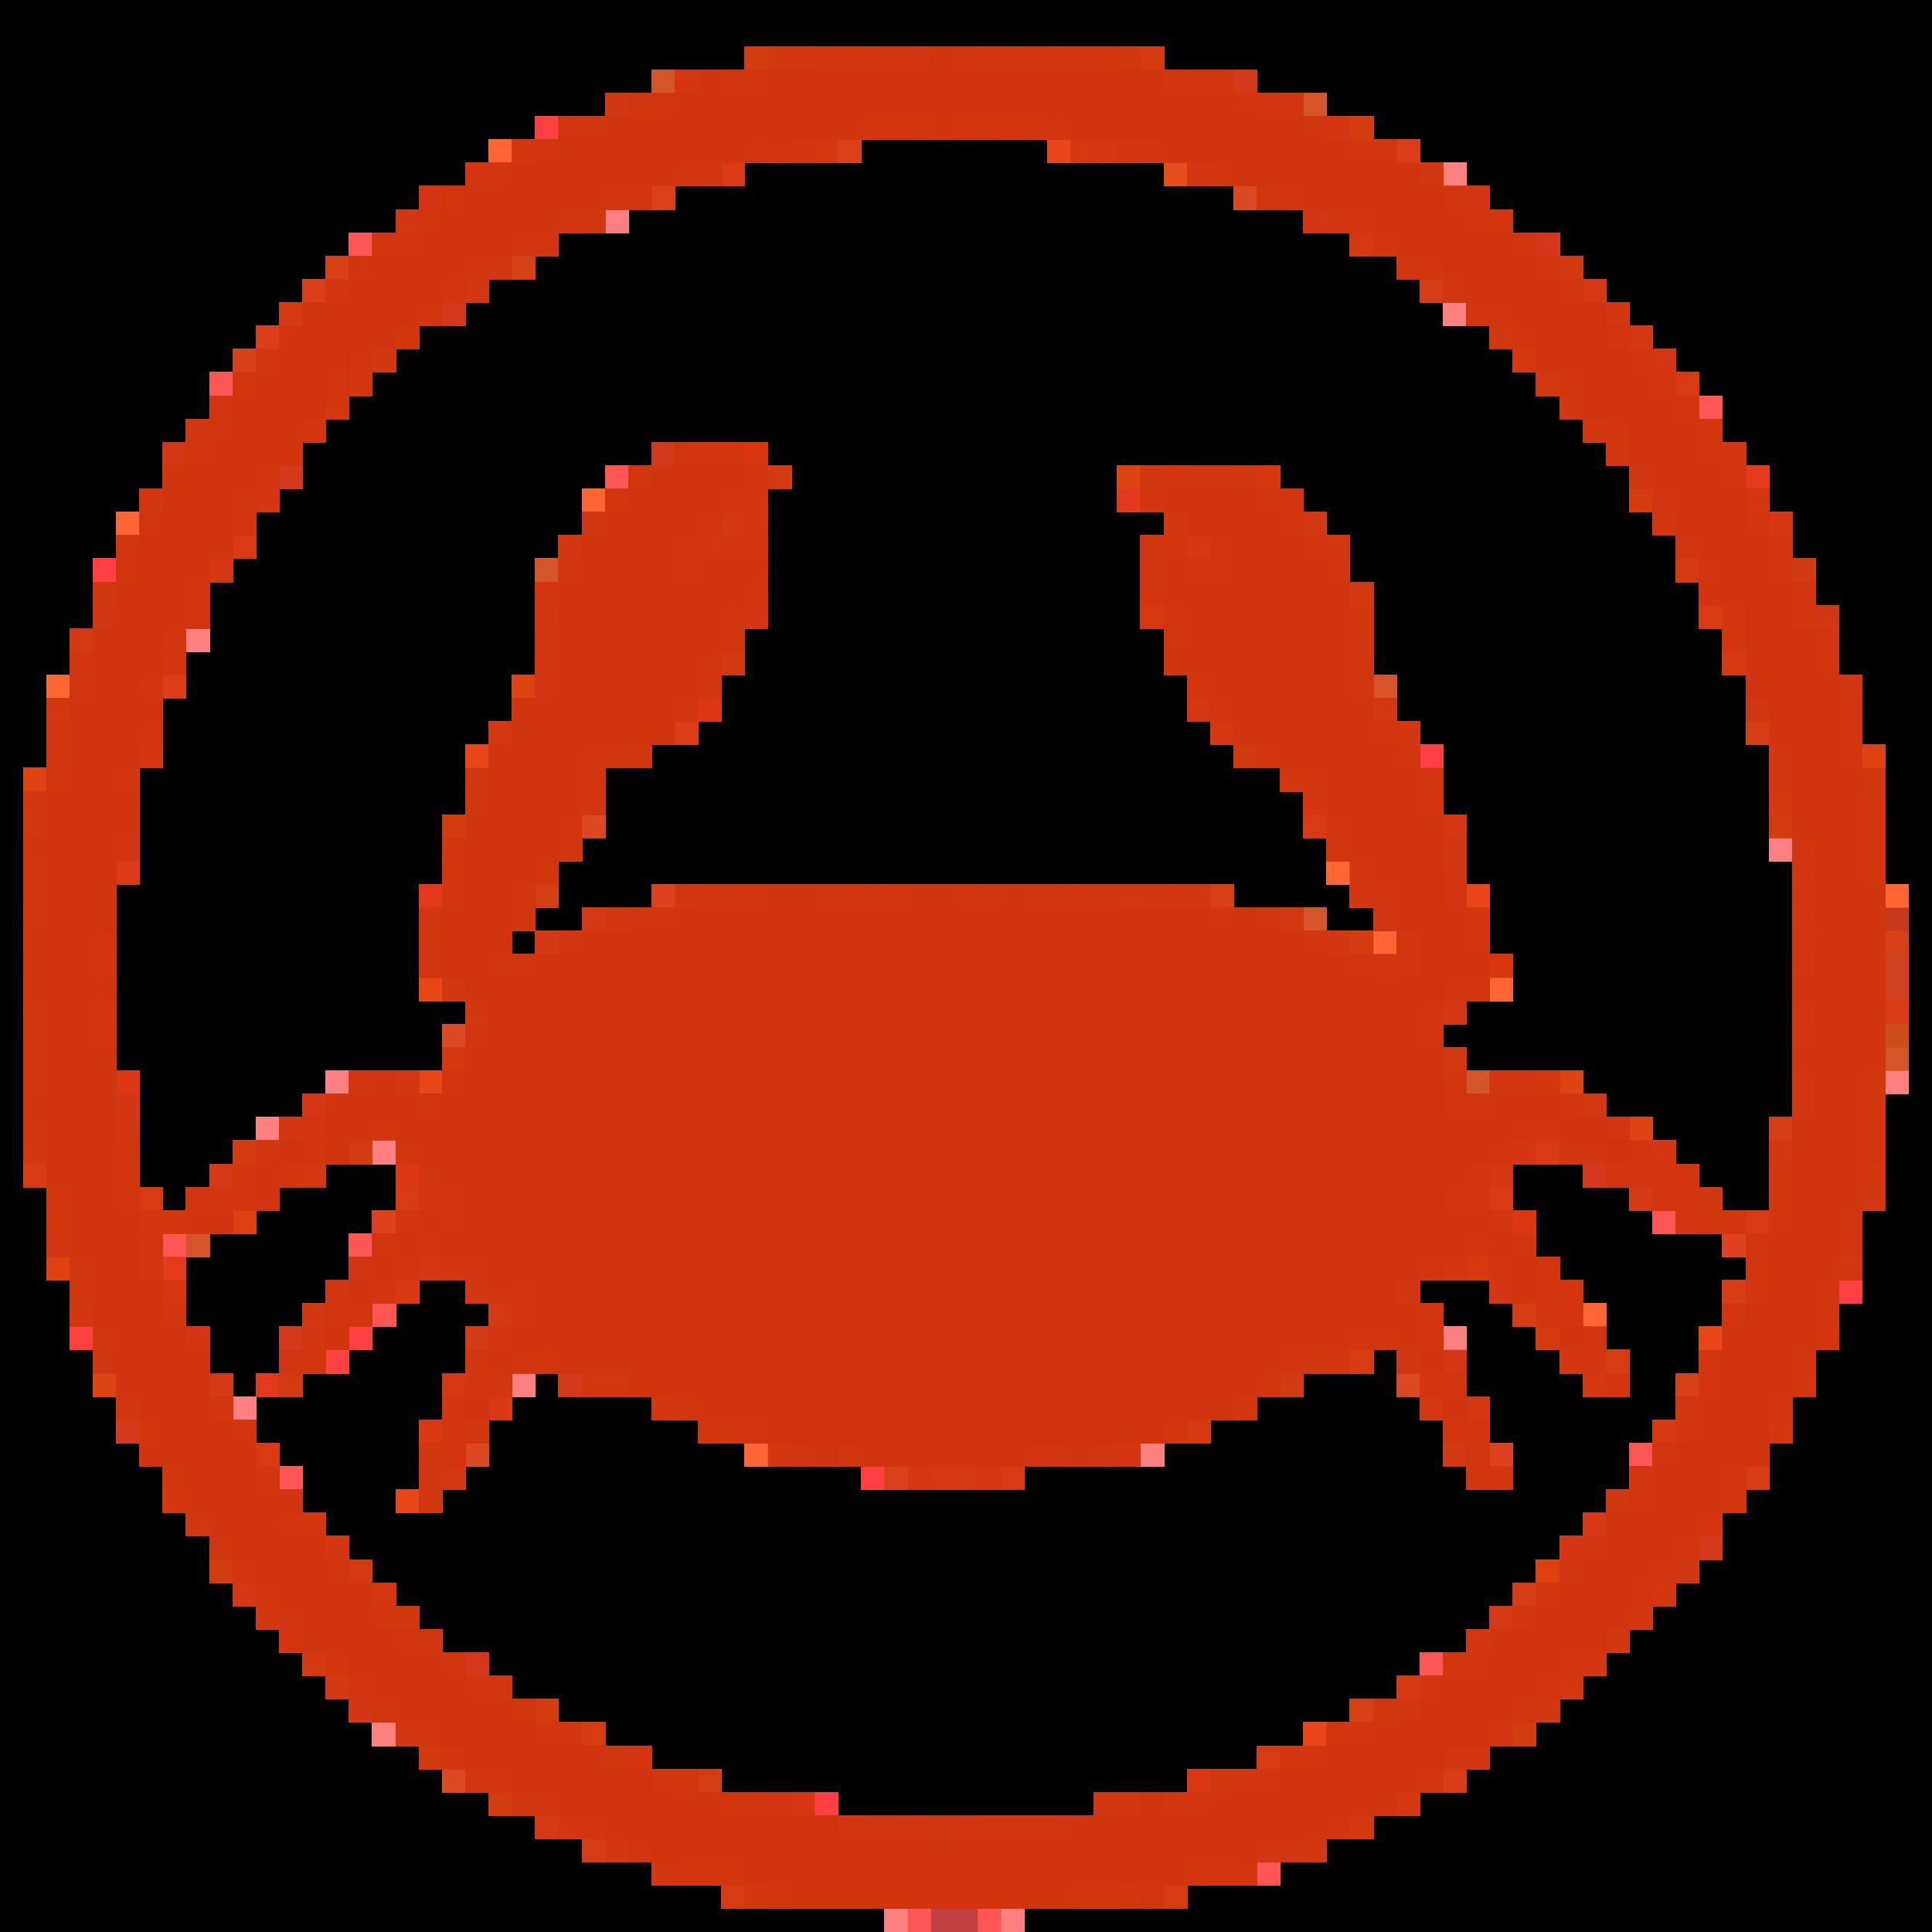 crustace-red